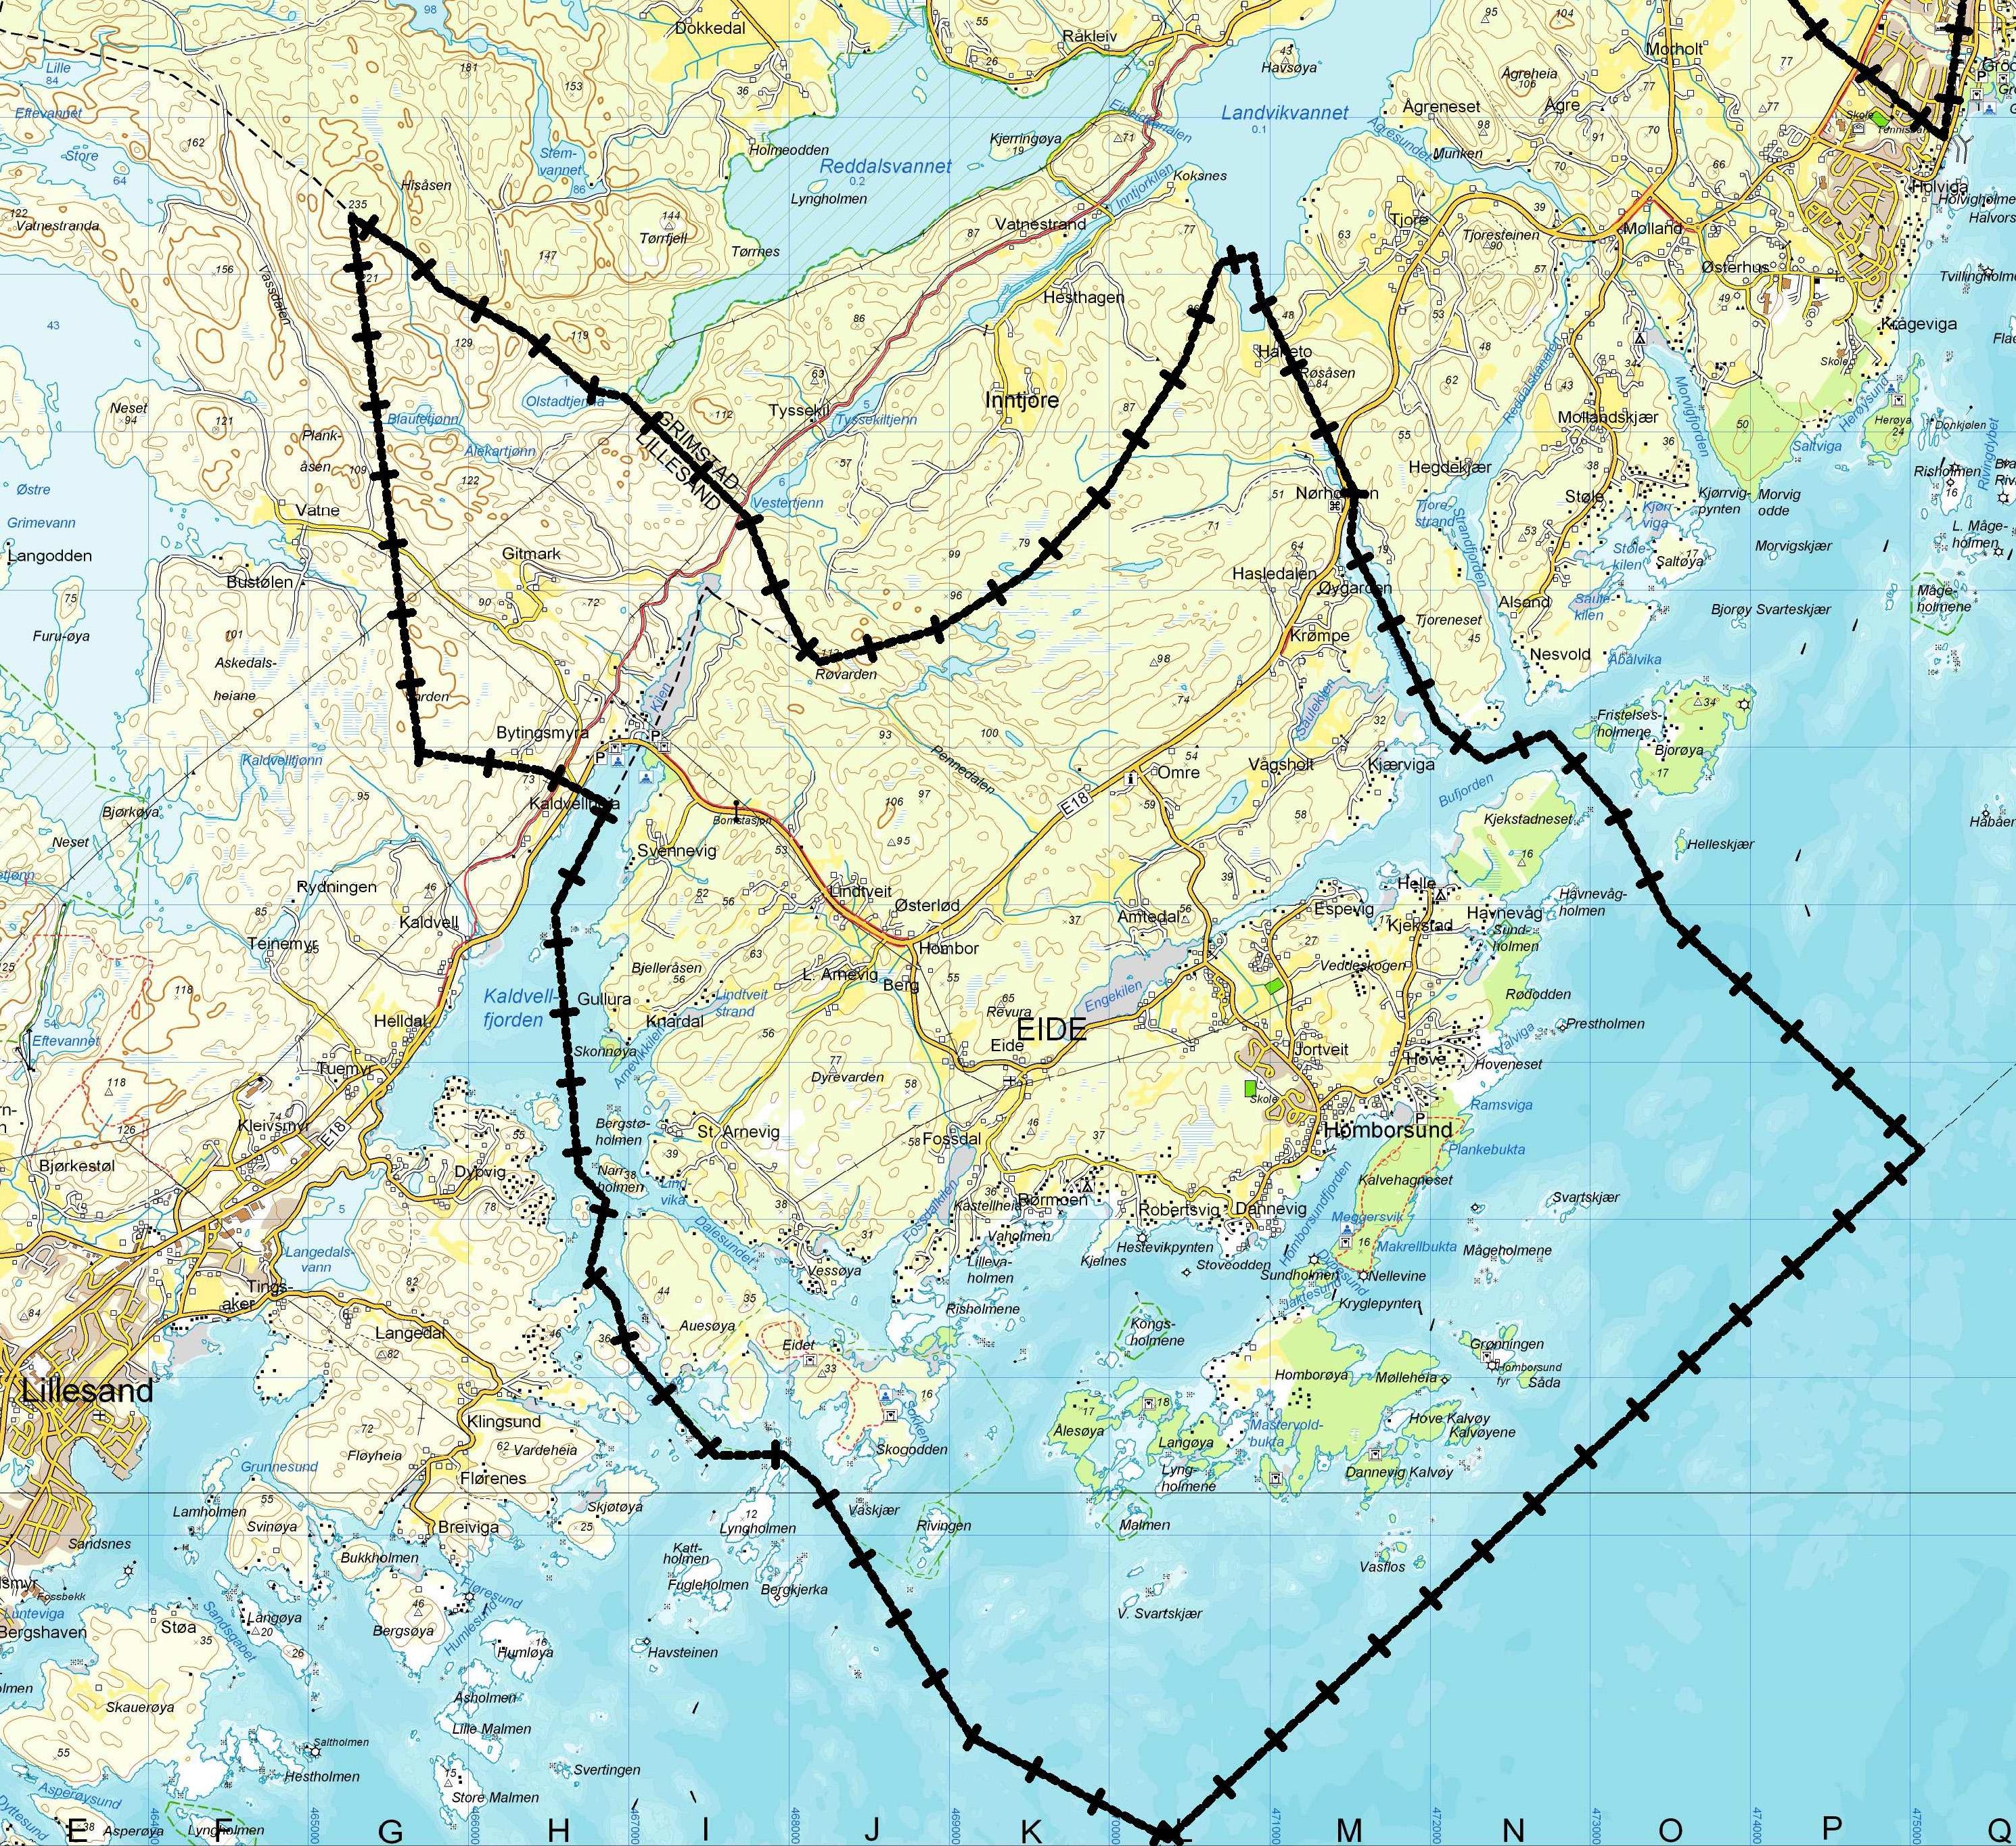 File Kart Eide Jpg Wikimedia Commons